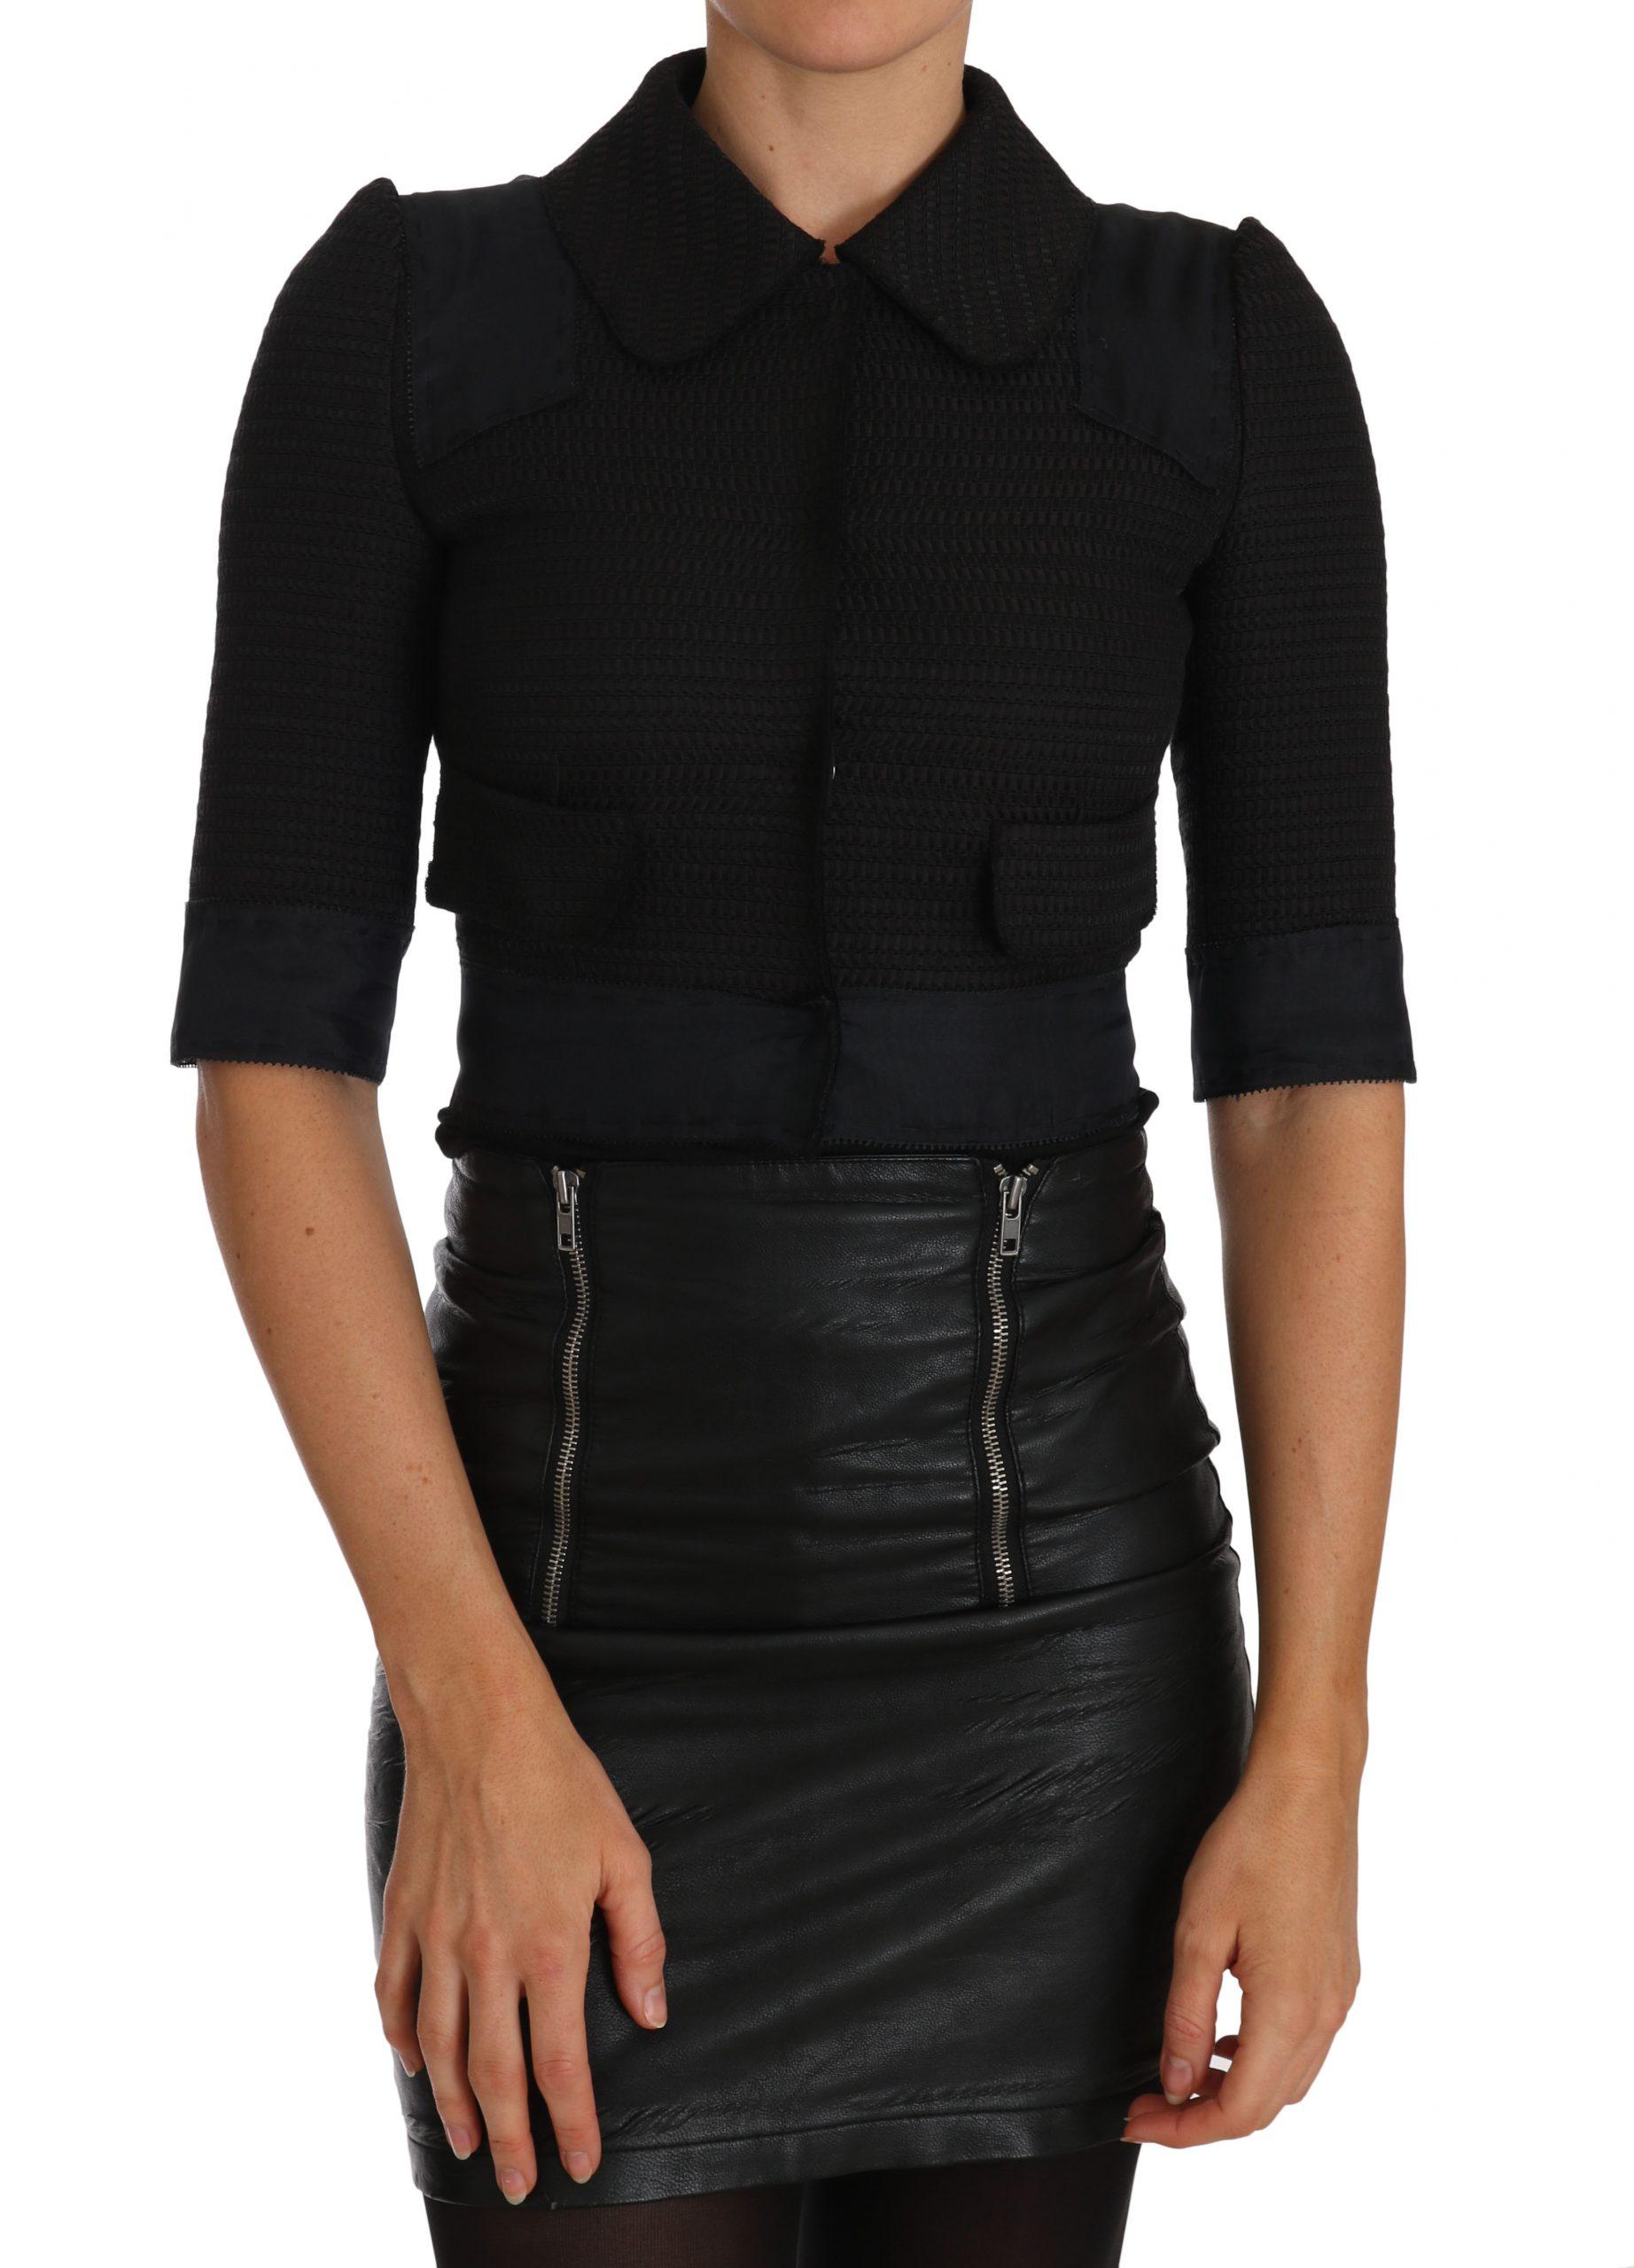 Dolce & Gabbana Women's Short Cropped Blazer Black TSH2296 - IT40|S